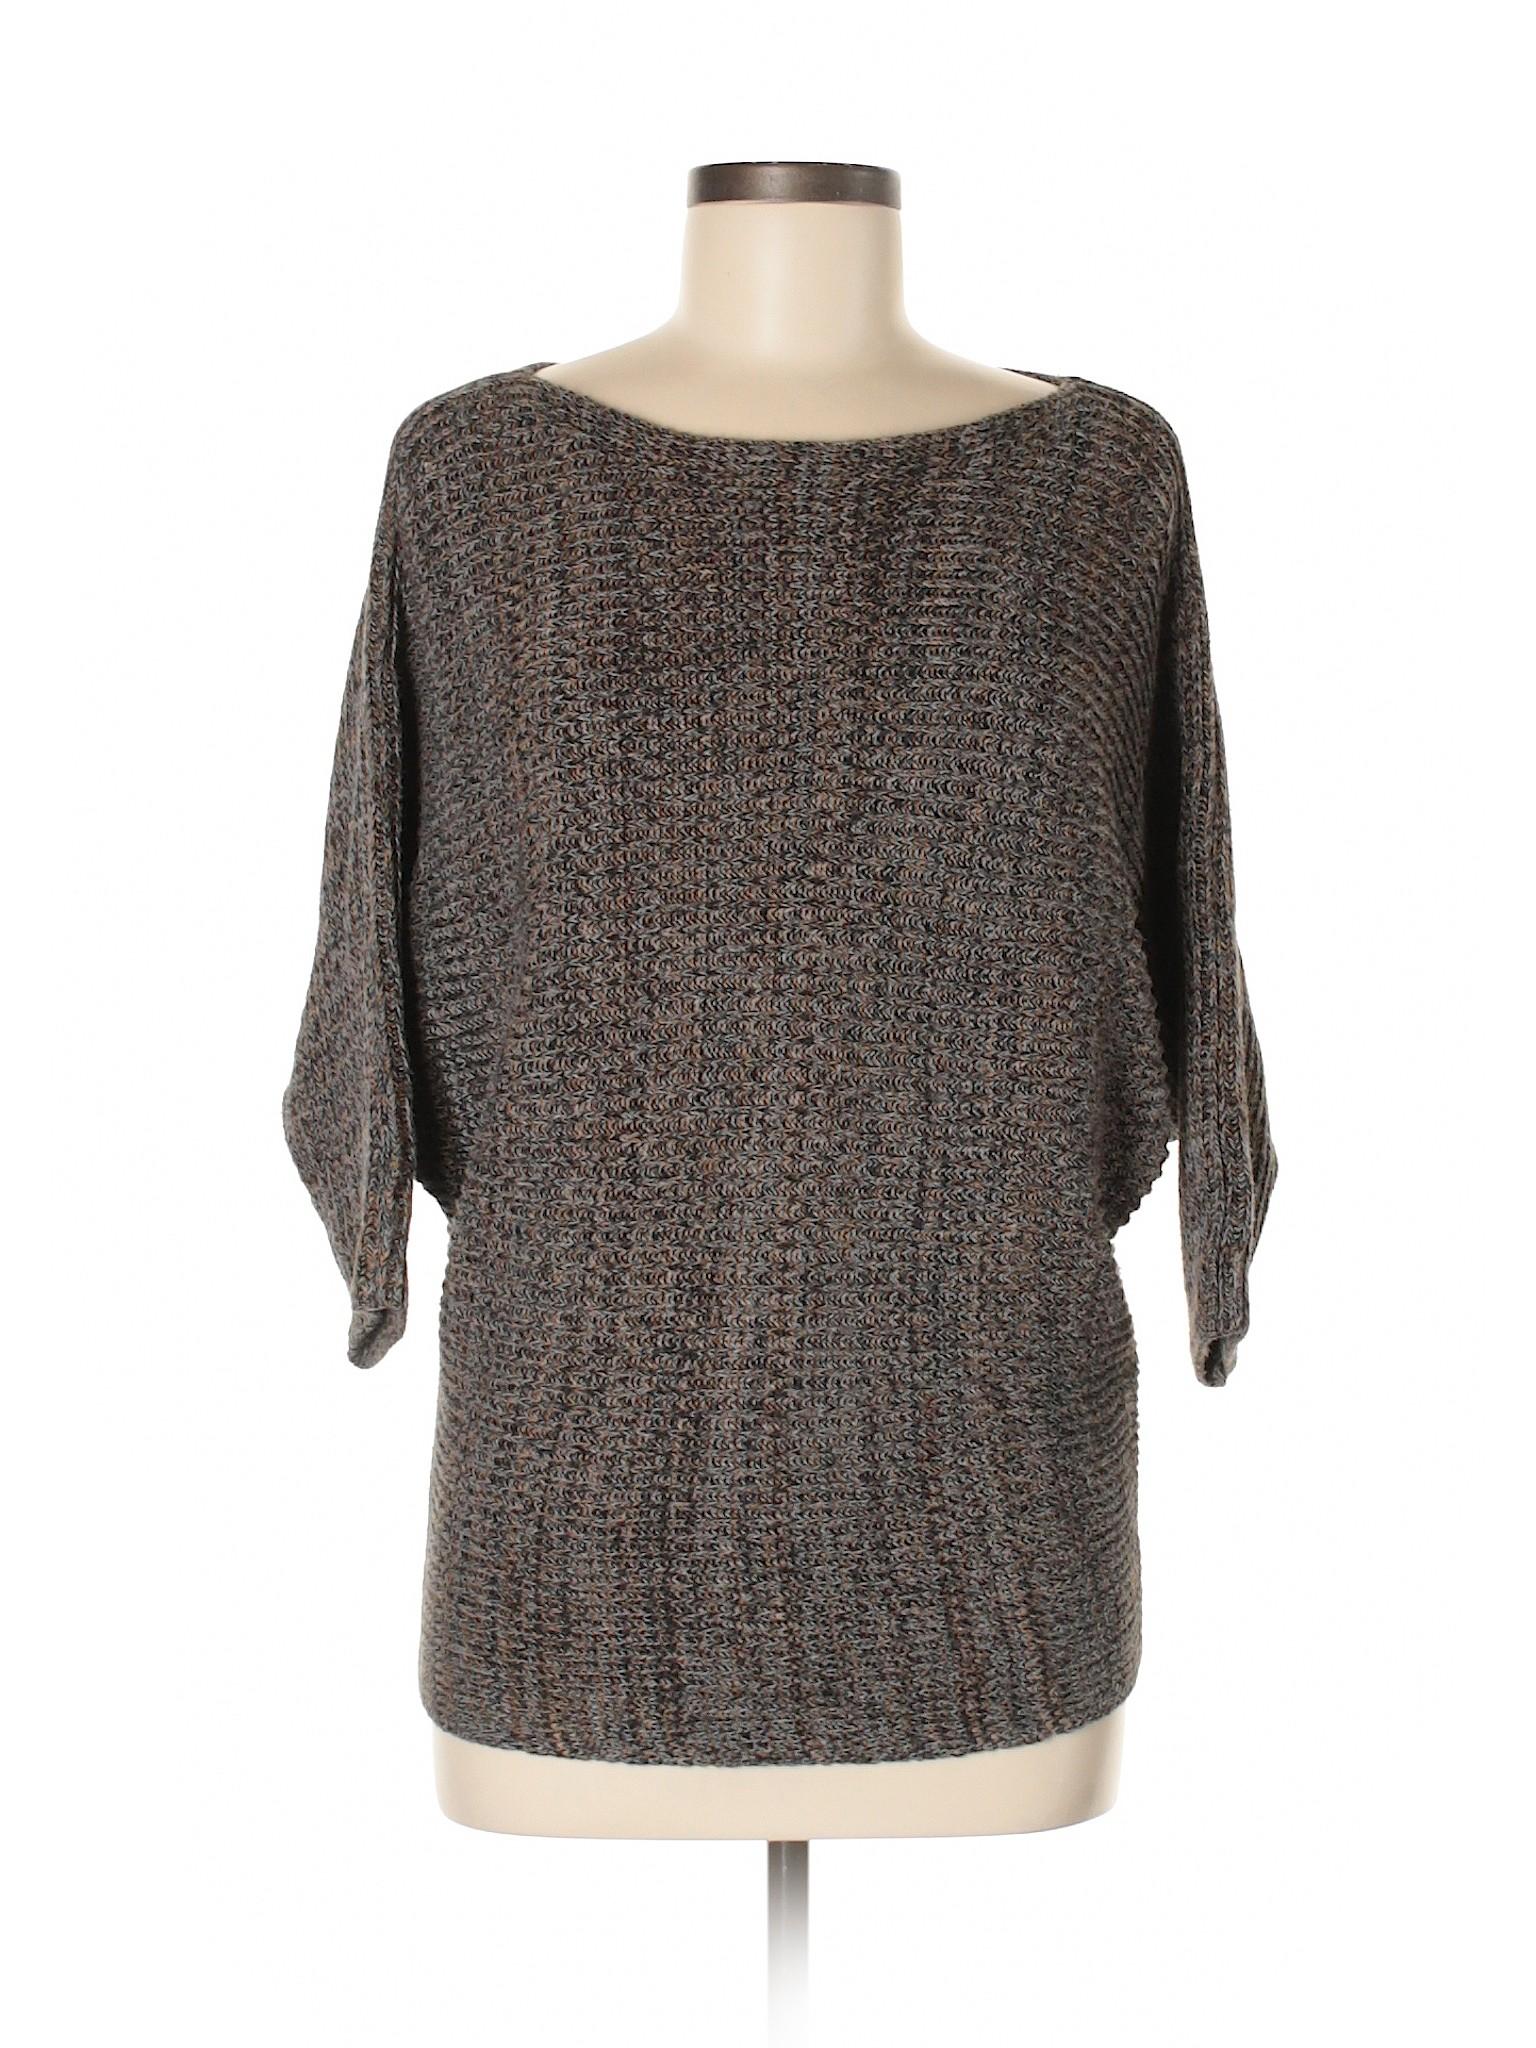 Boutique KLEIN CALVIN Sweater JEANS Pullover rqrZUCw